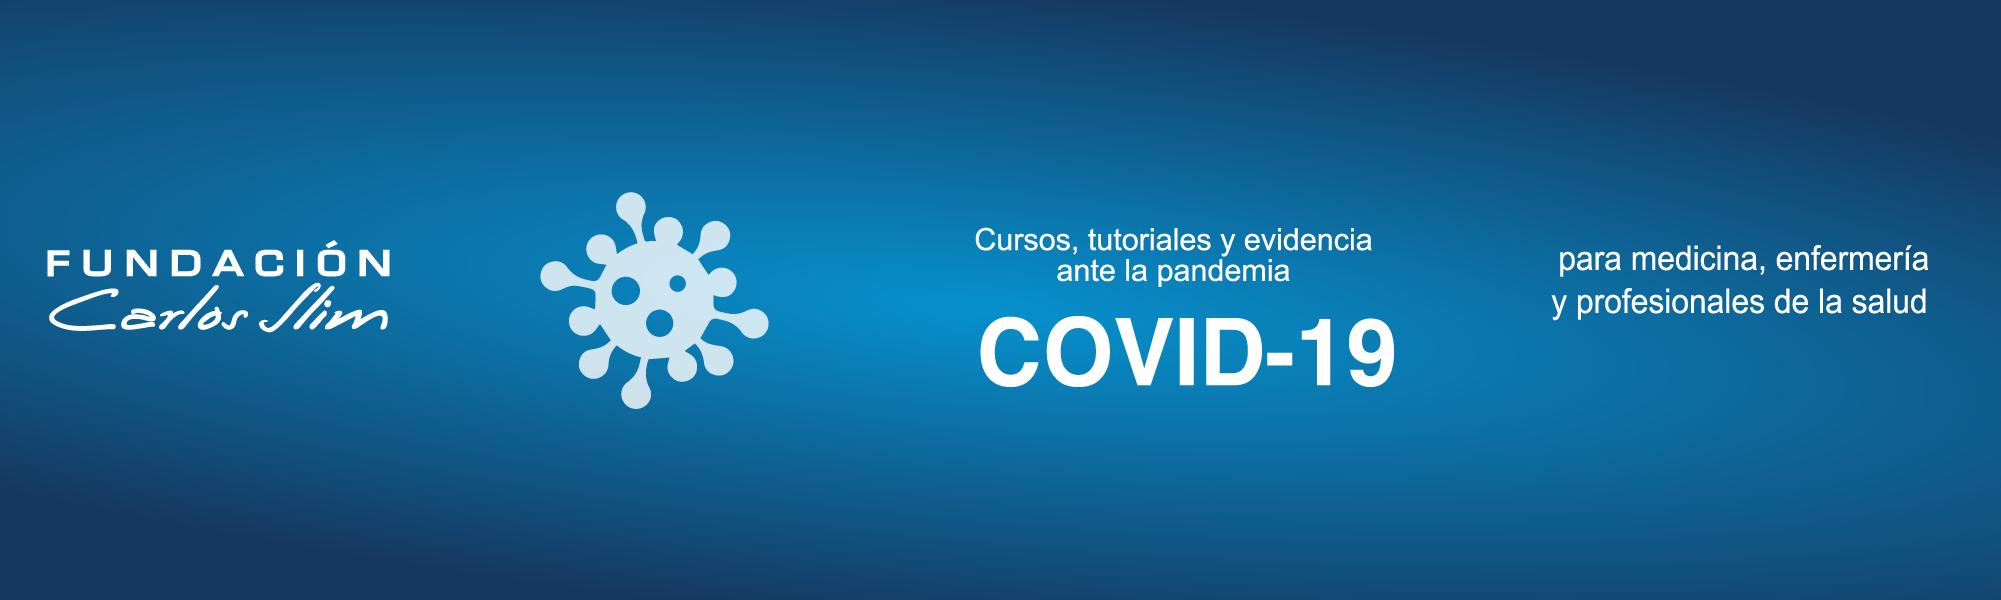 Banner-COVID